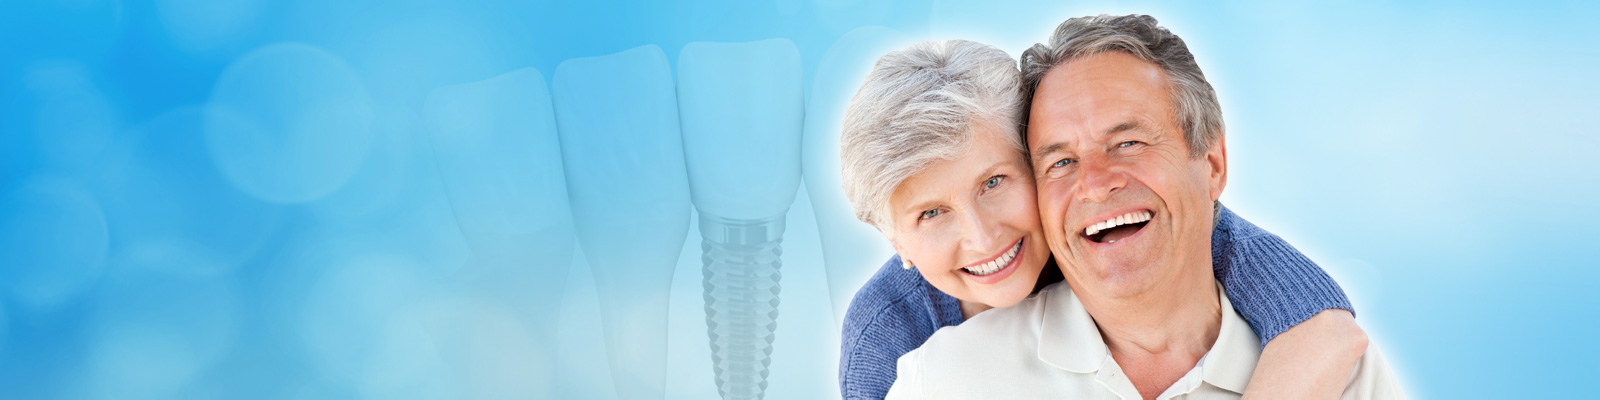 putney-periodontics-home-banner